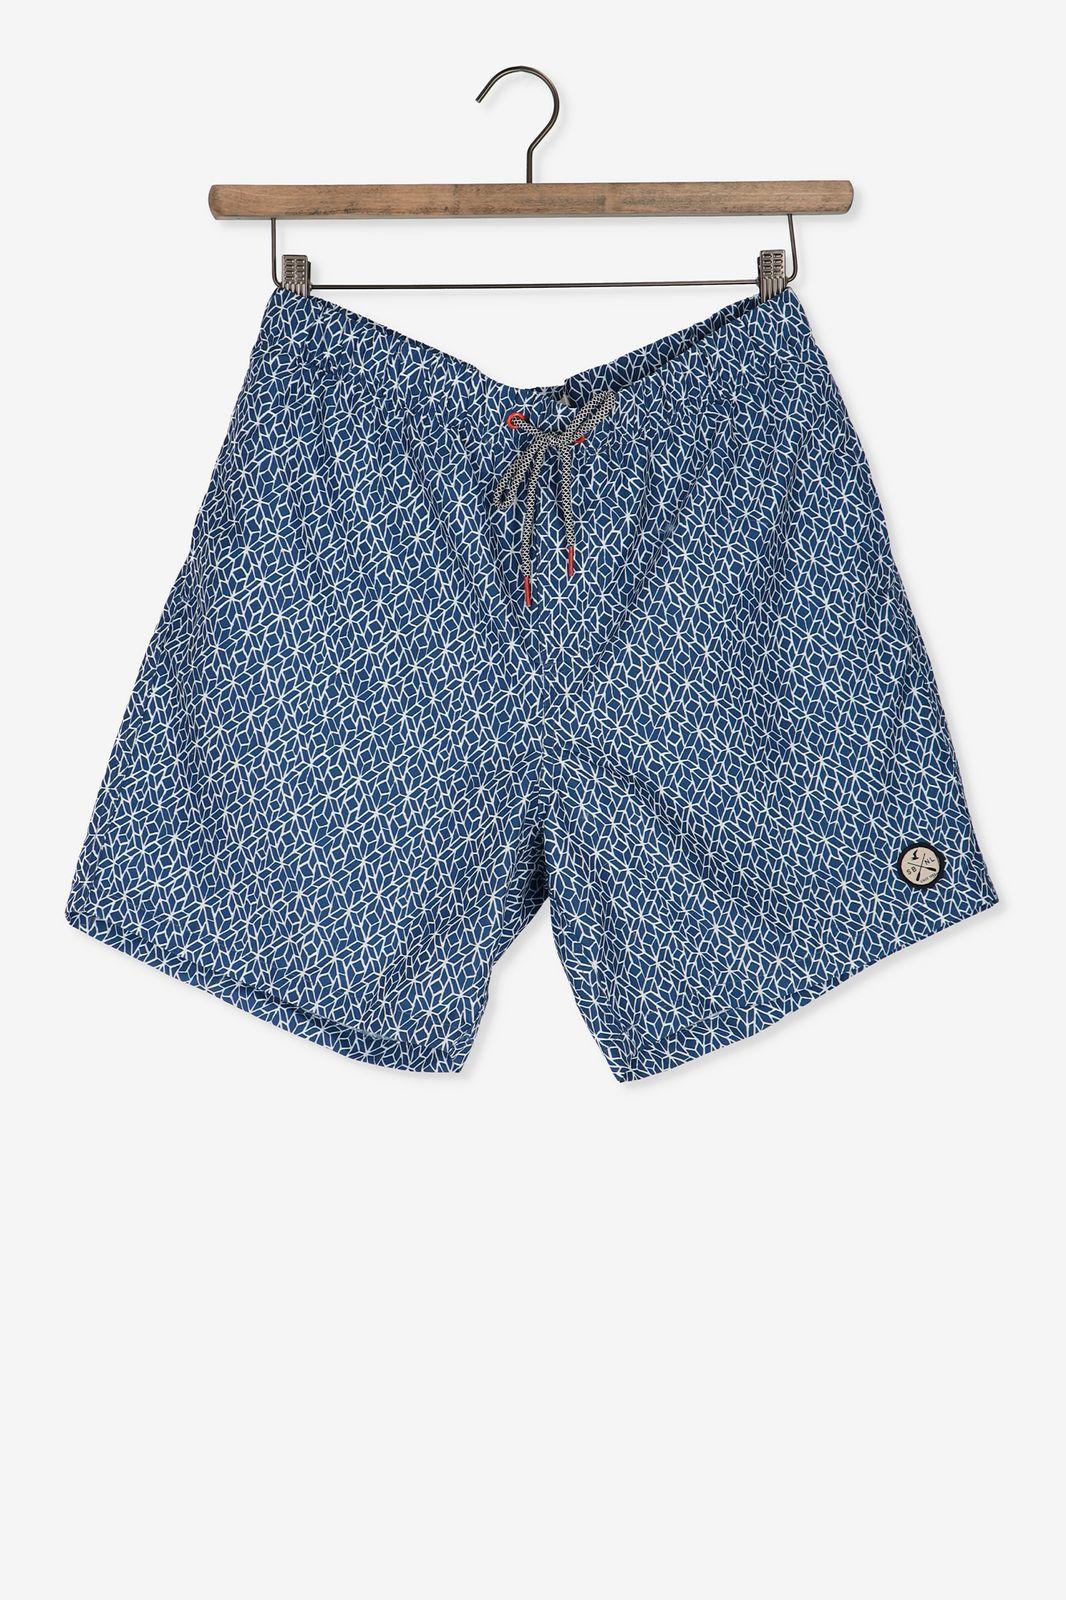 Blauwe zwembroek print - Heren | Sissy-Boy